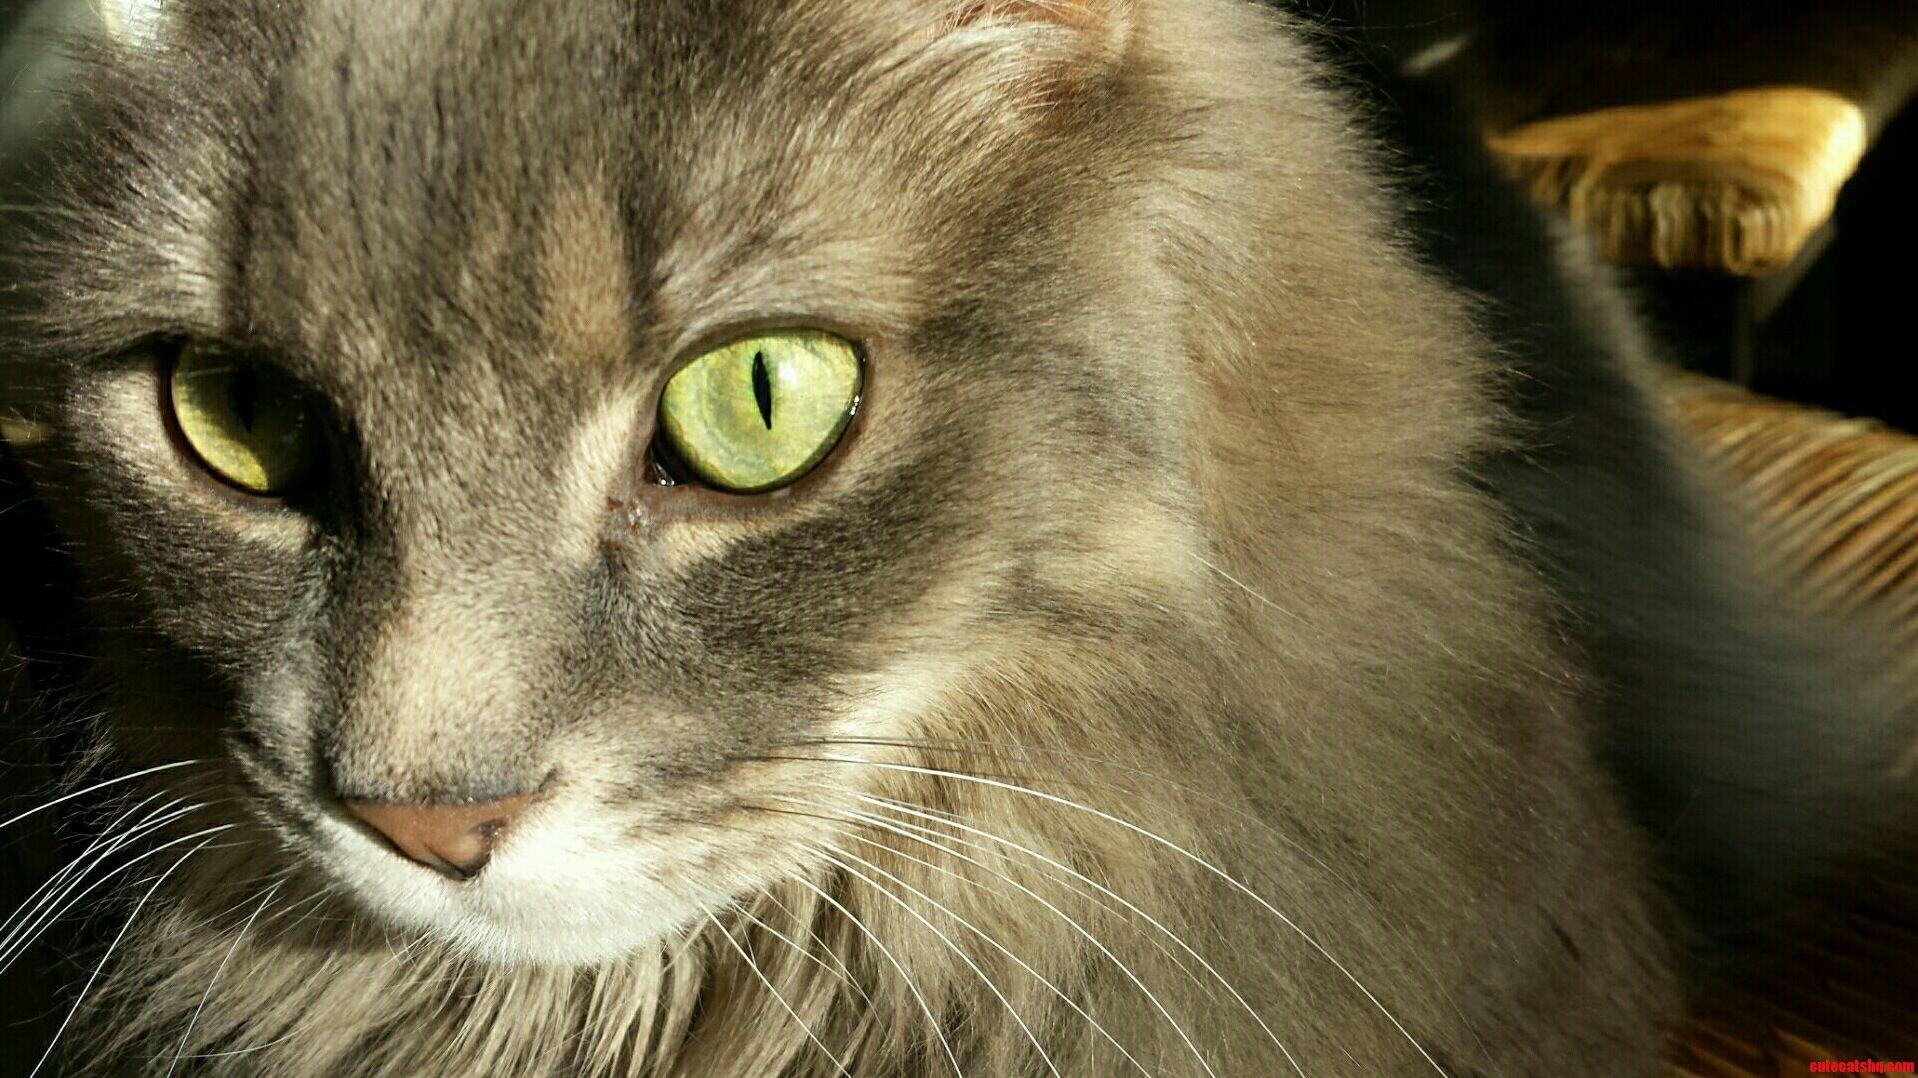 I Love Him - http://cutecatshq.com/cats/i-love-him-2/